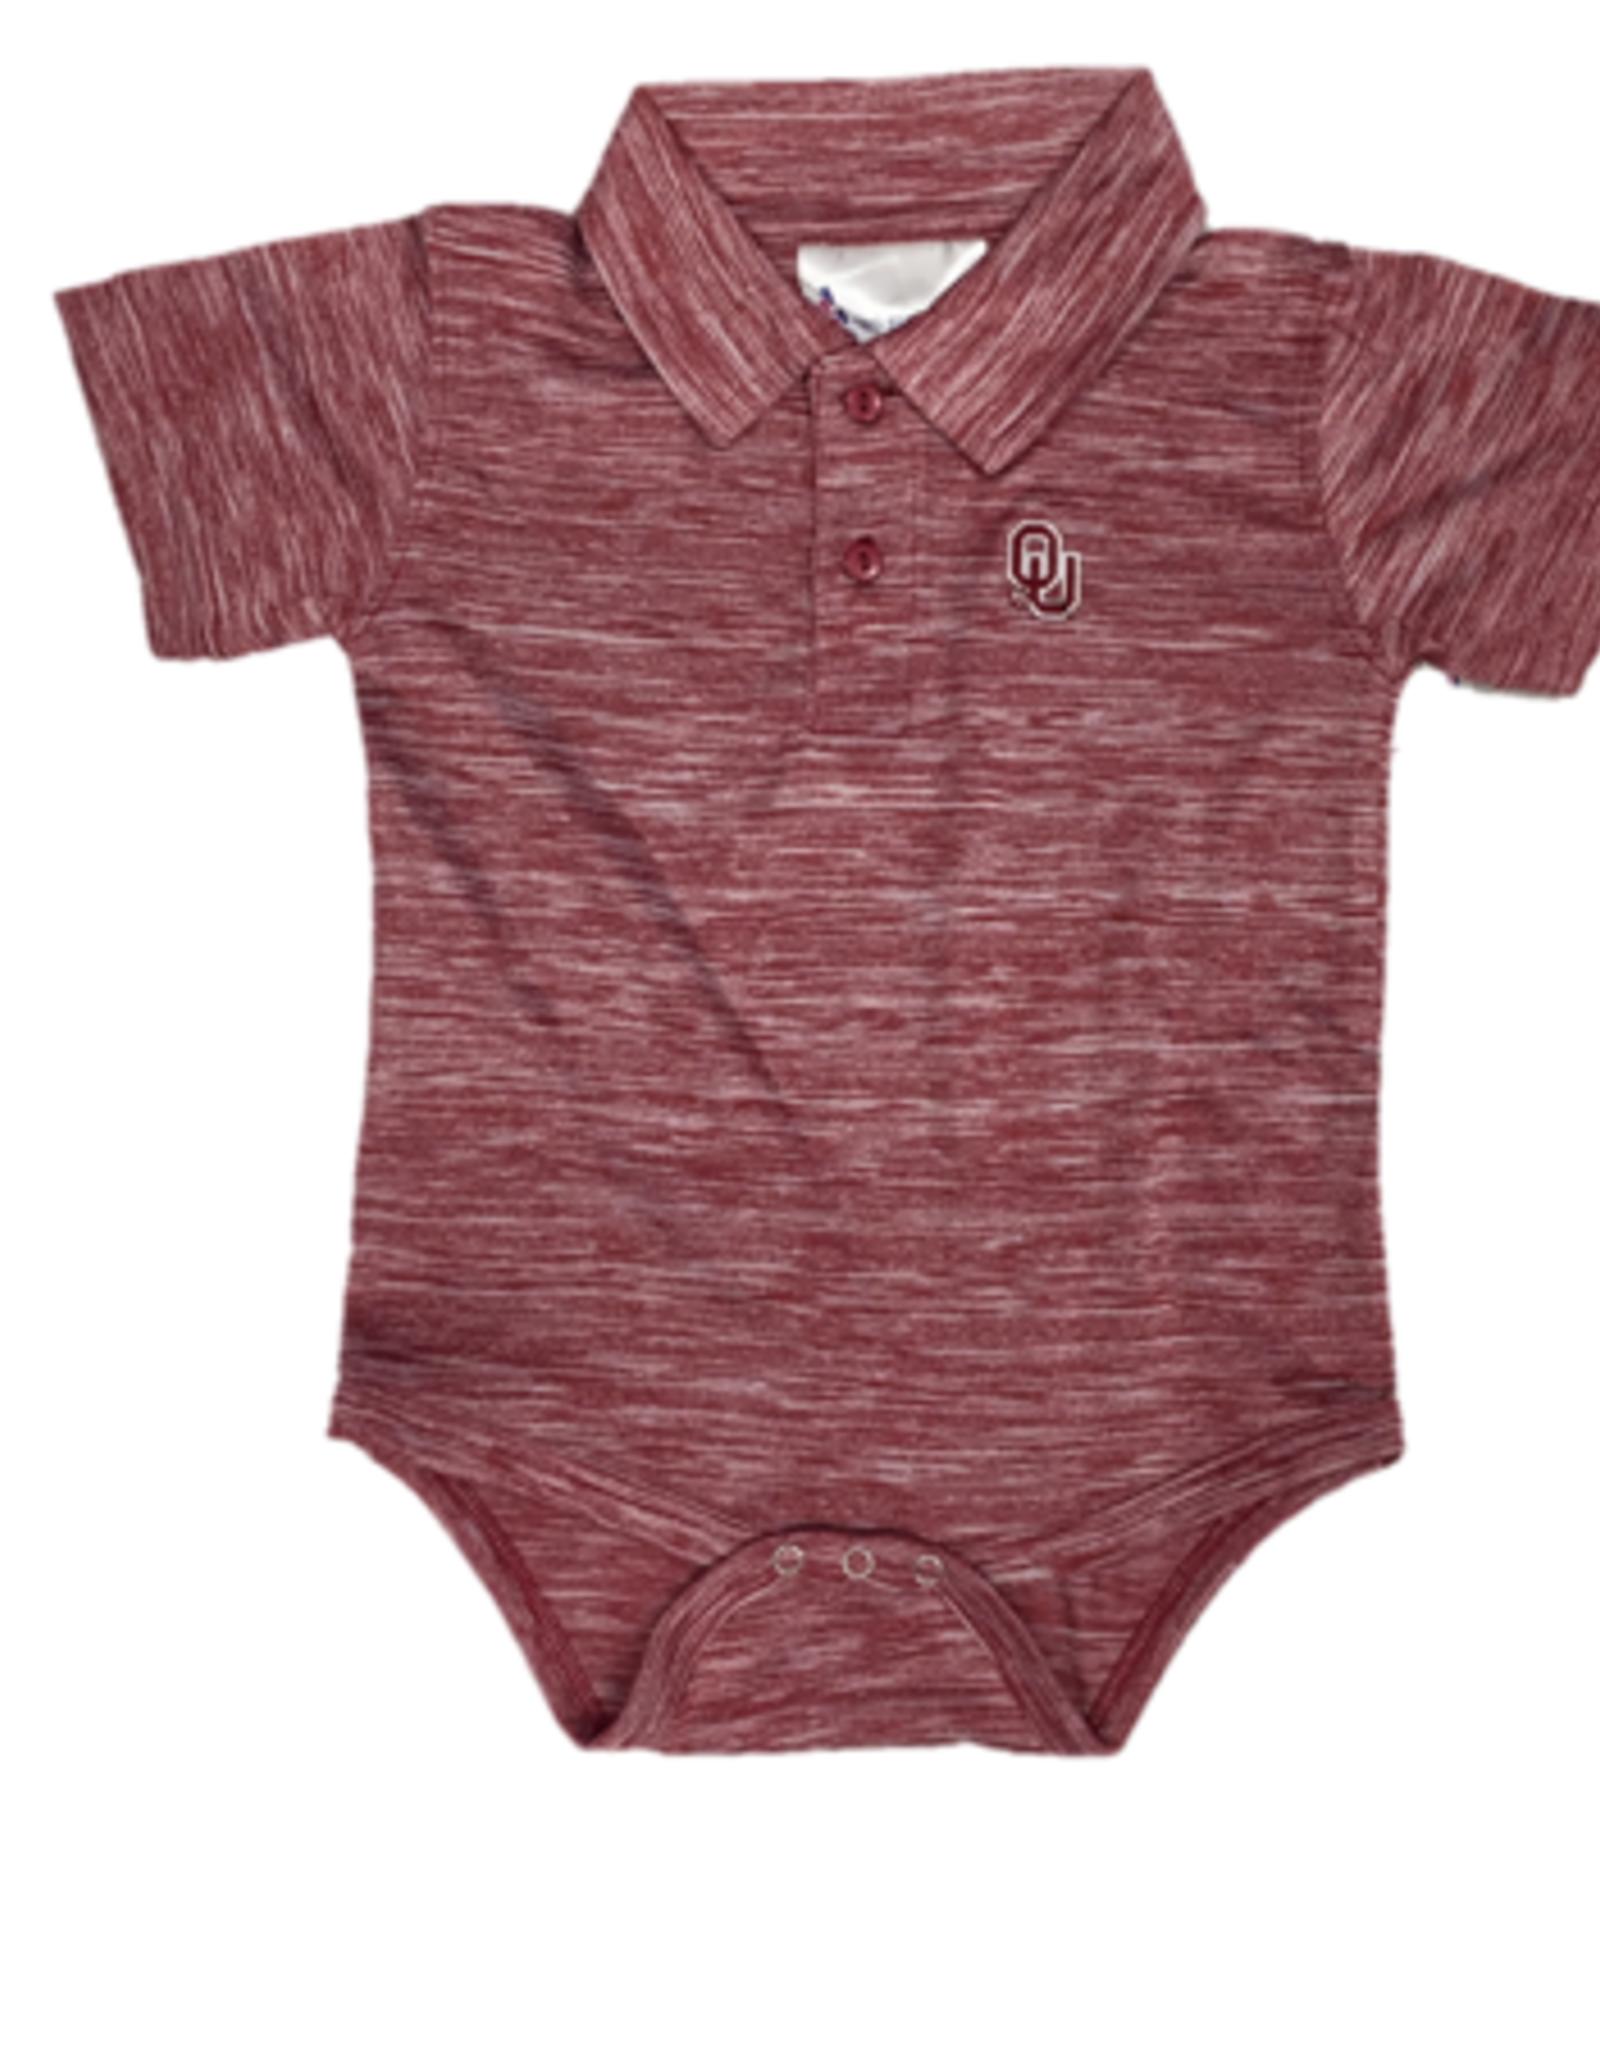 Two Feet Ahead Infant OU Spacedye Crimson Golf Creeper